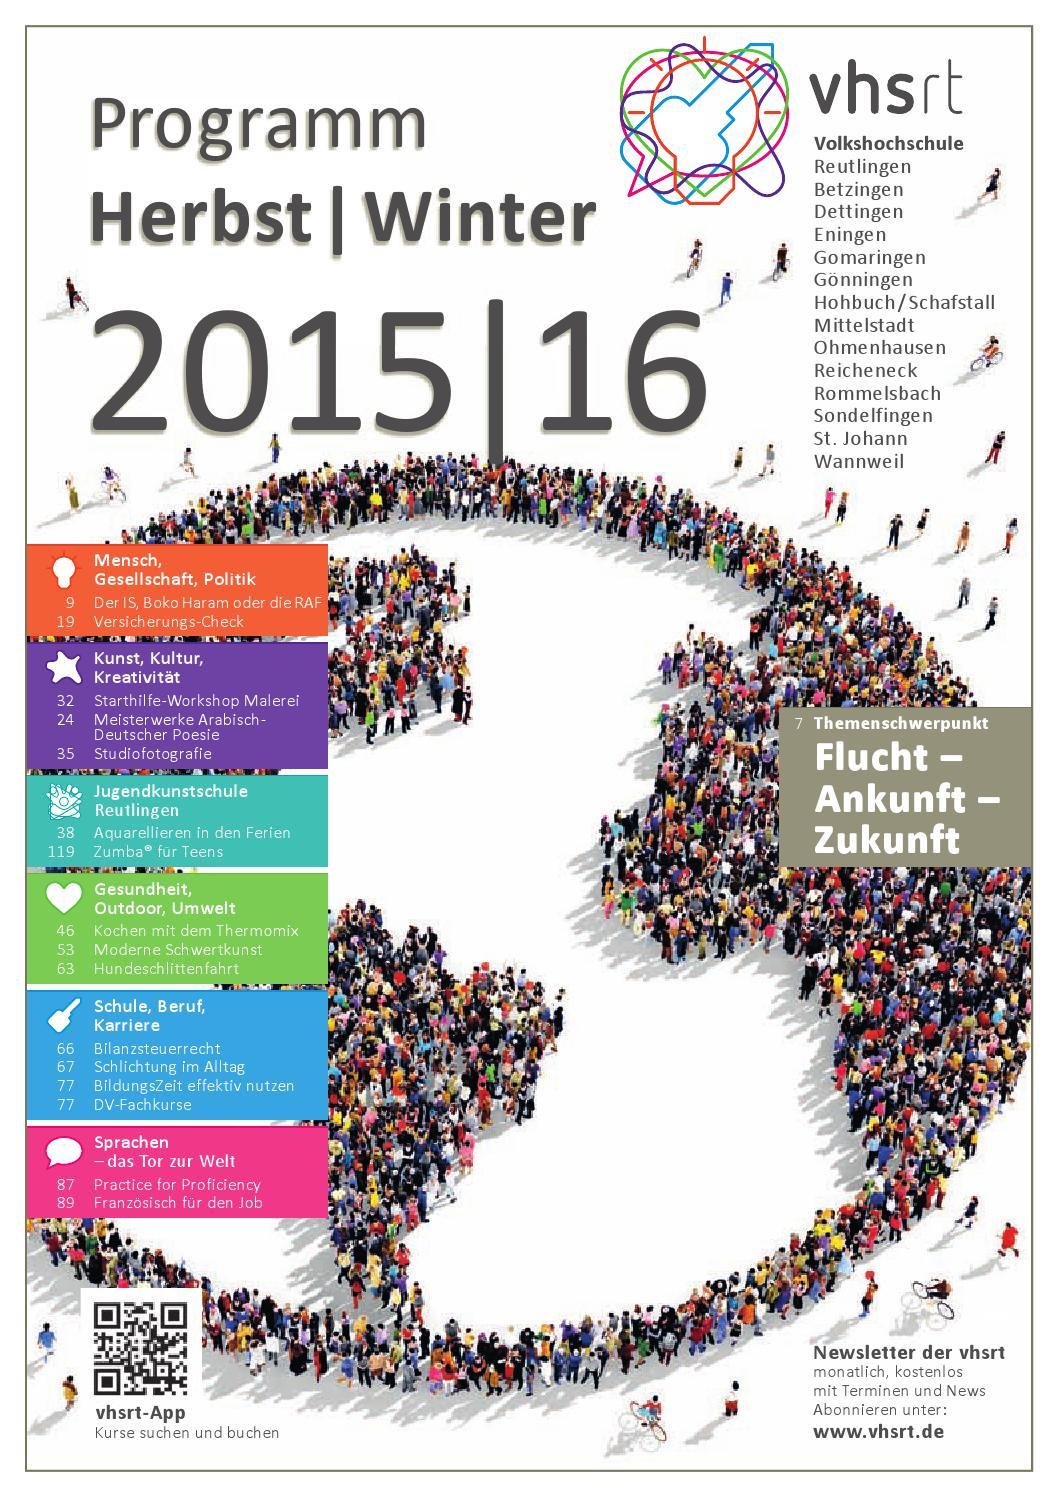 Programm Herbst/Winter 2015|16 by Volkshochschule Reutlingen - issuu